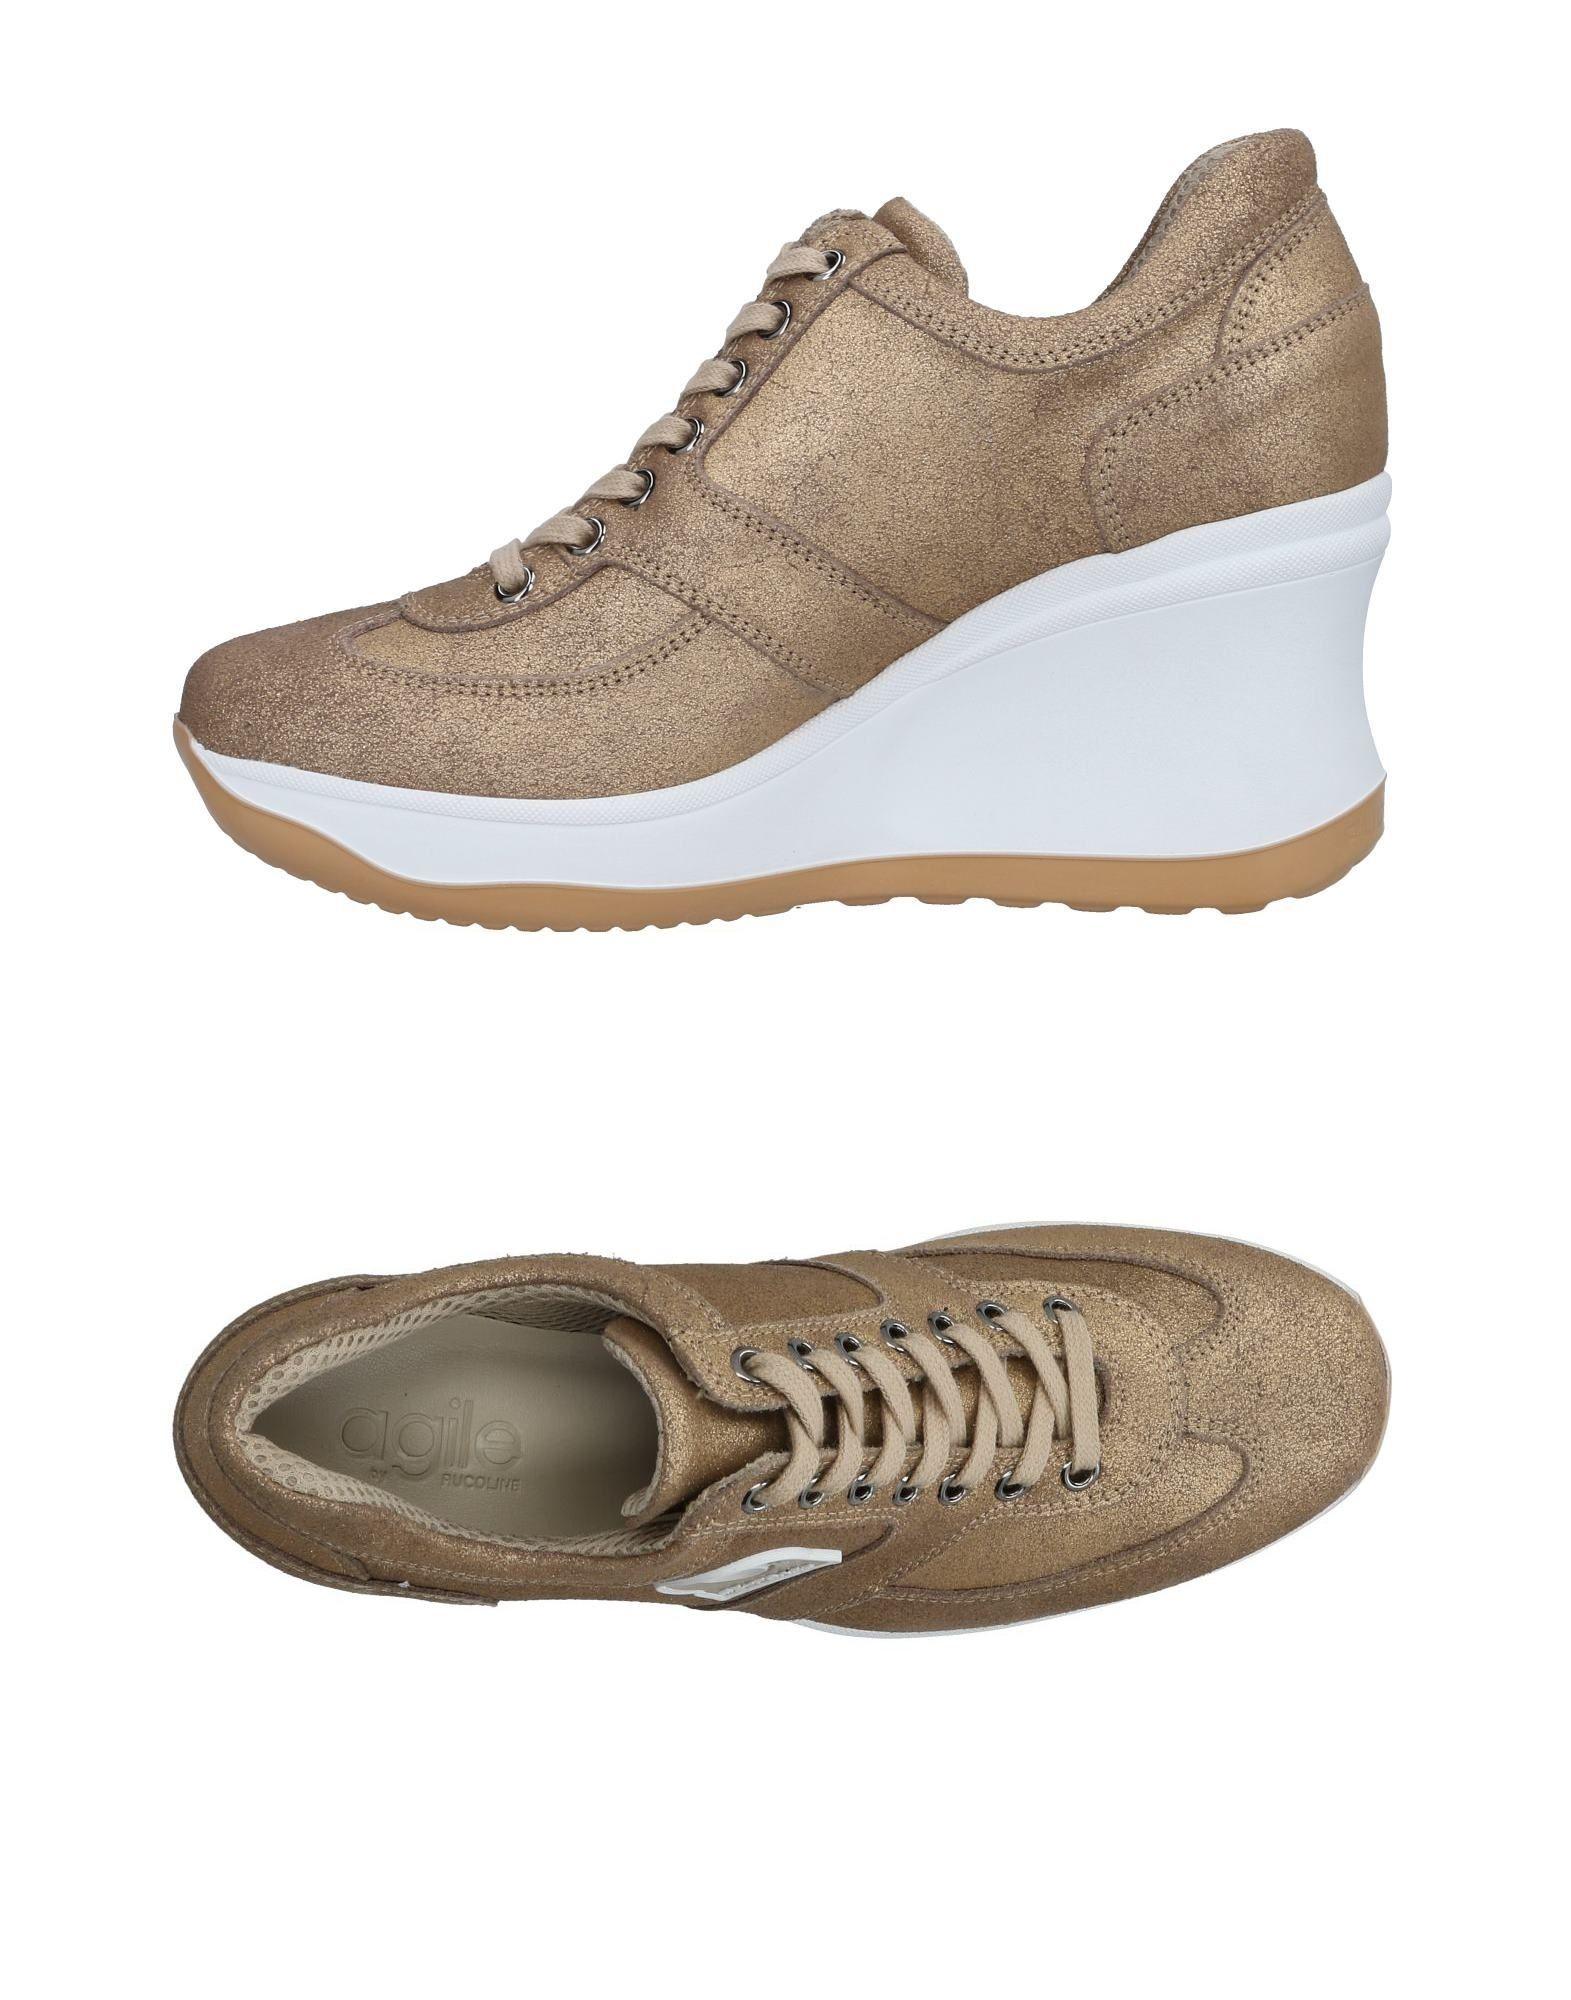 Agile By Gute Rucoline Sneakers Damen  11495876XR Gute By Qualität beliebte Schuhe ff3919